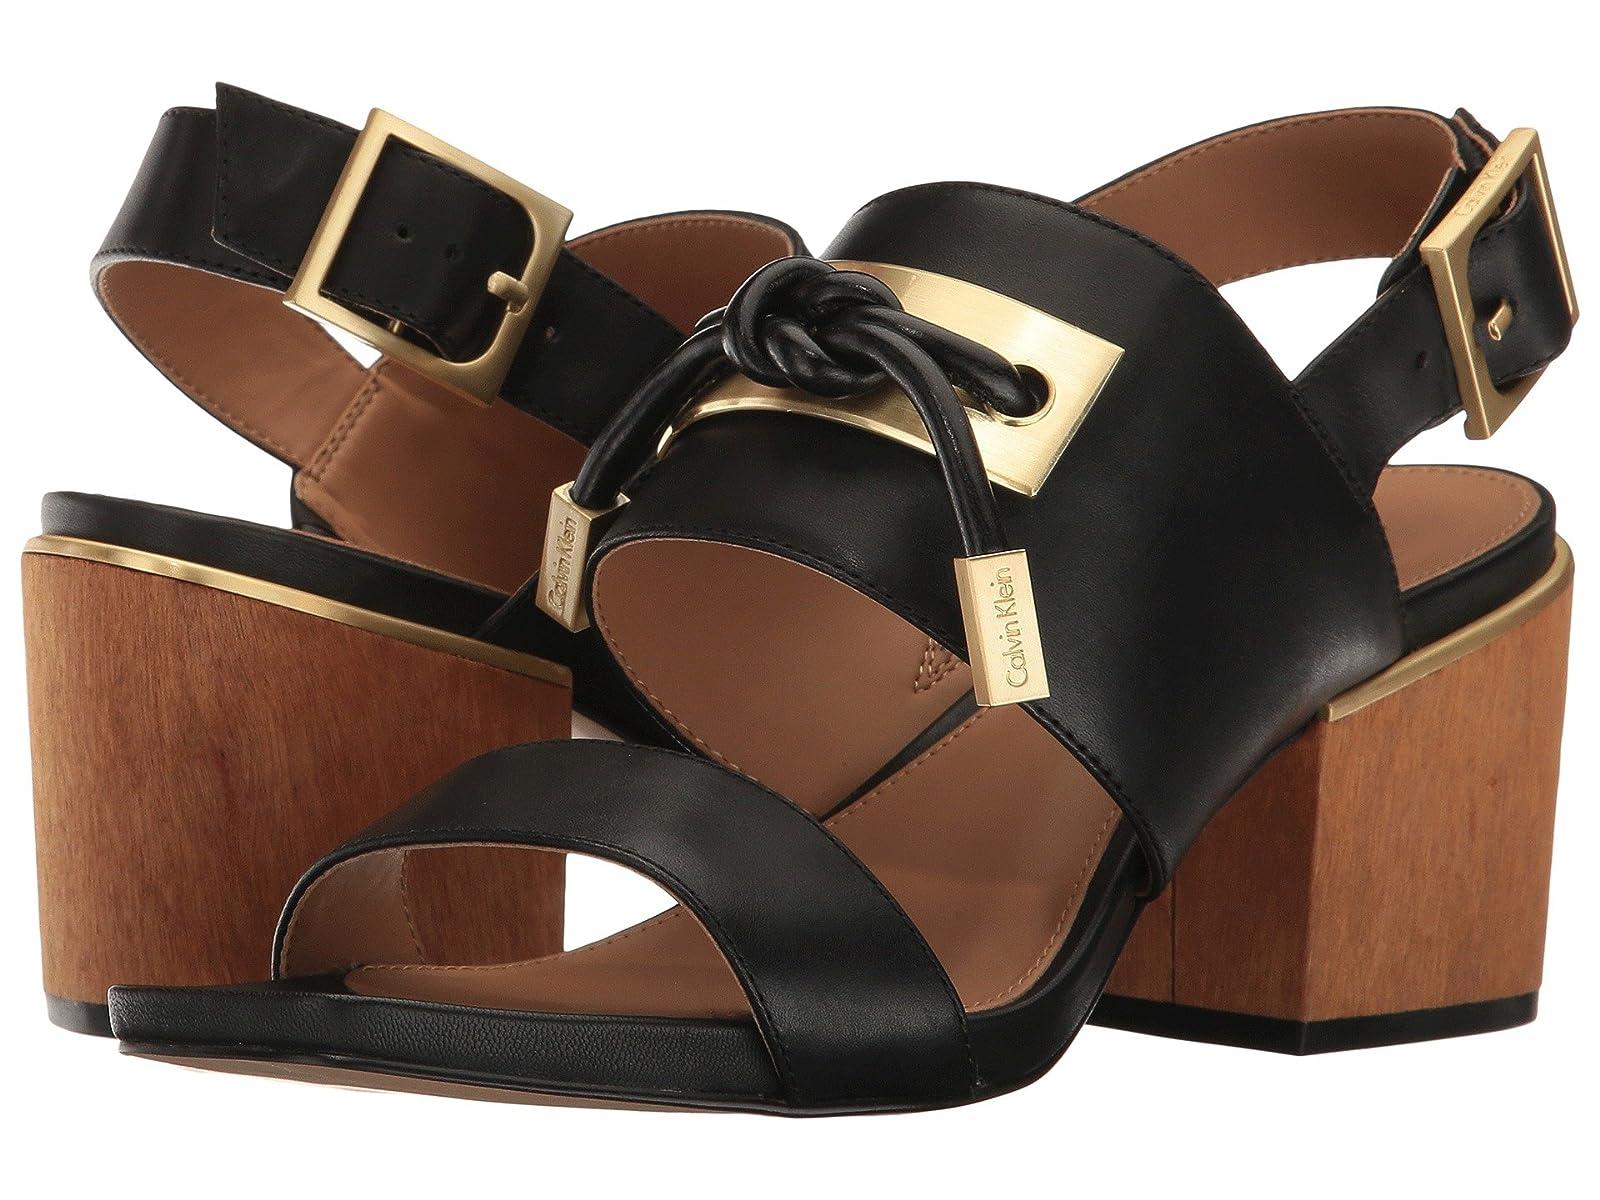 Calvin Klein JillineCheap and distinctive eye-catching shoes